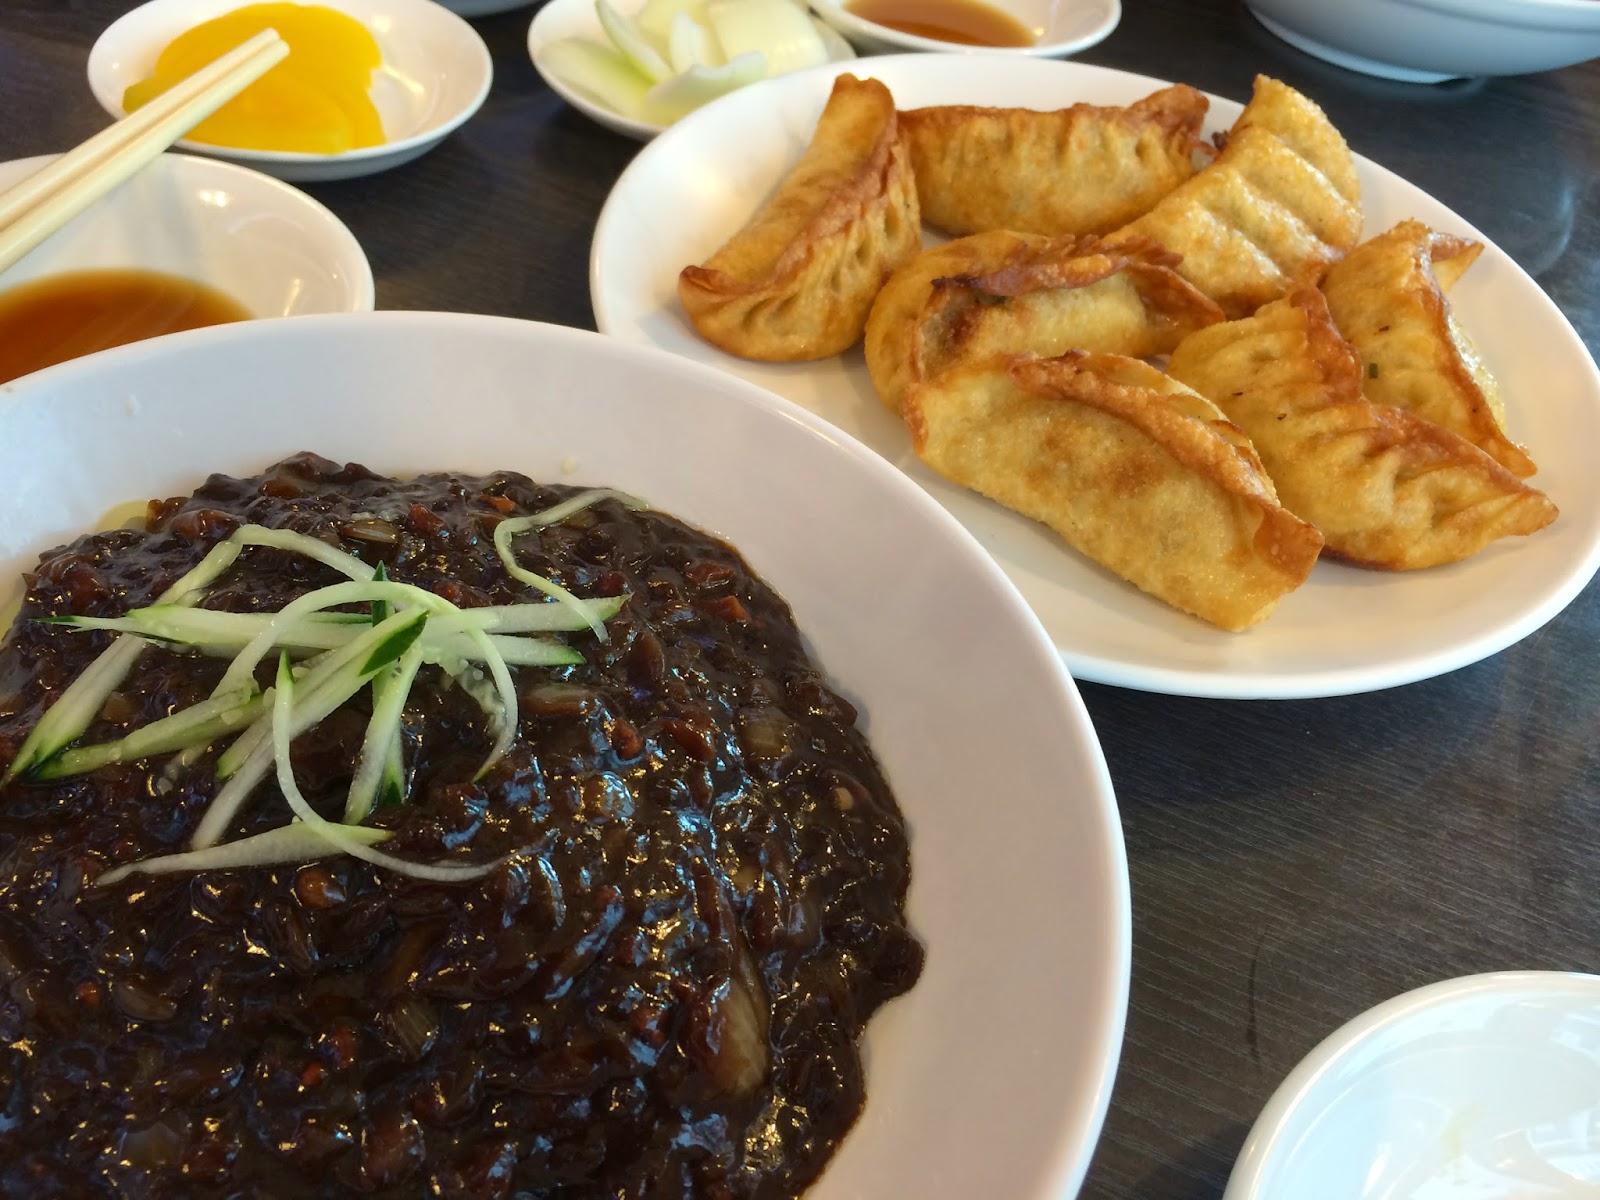 The Seoul Eats List of Best Noodles in Korea - Seoul Eats